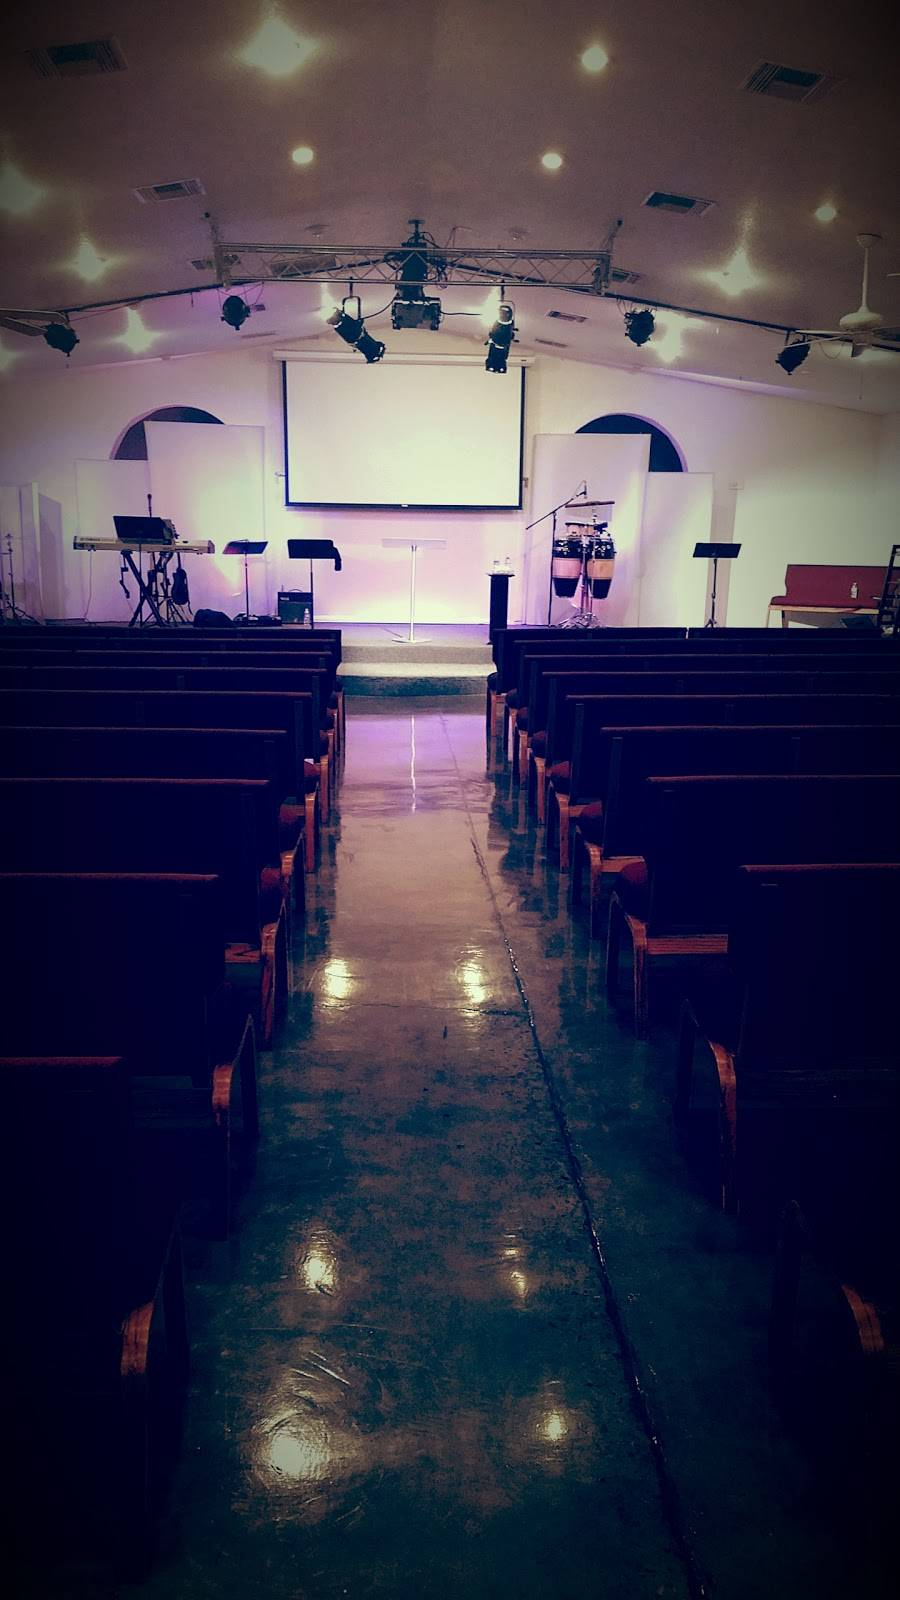 Newlife Covenant Church - church    Photo 4 of 9   Address: 541 E Main St, Avondale, AZ 85323, USA   Phone: (623) 932-1670